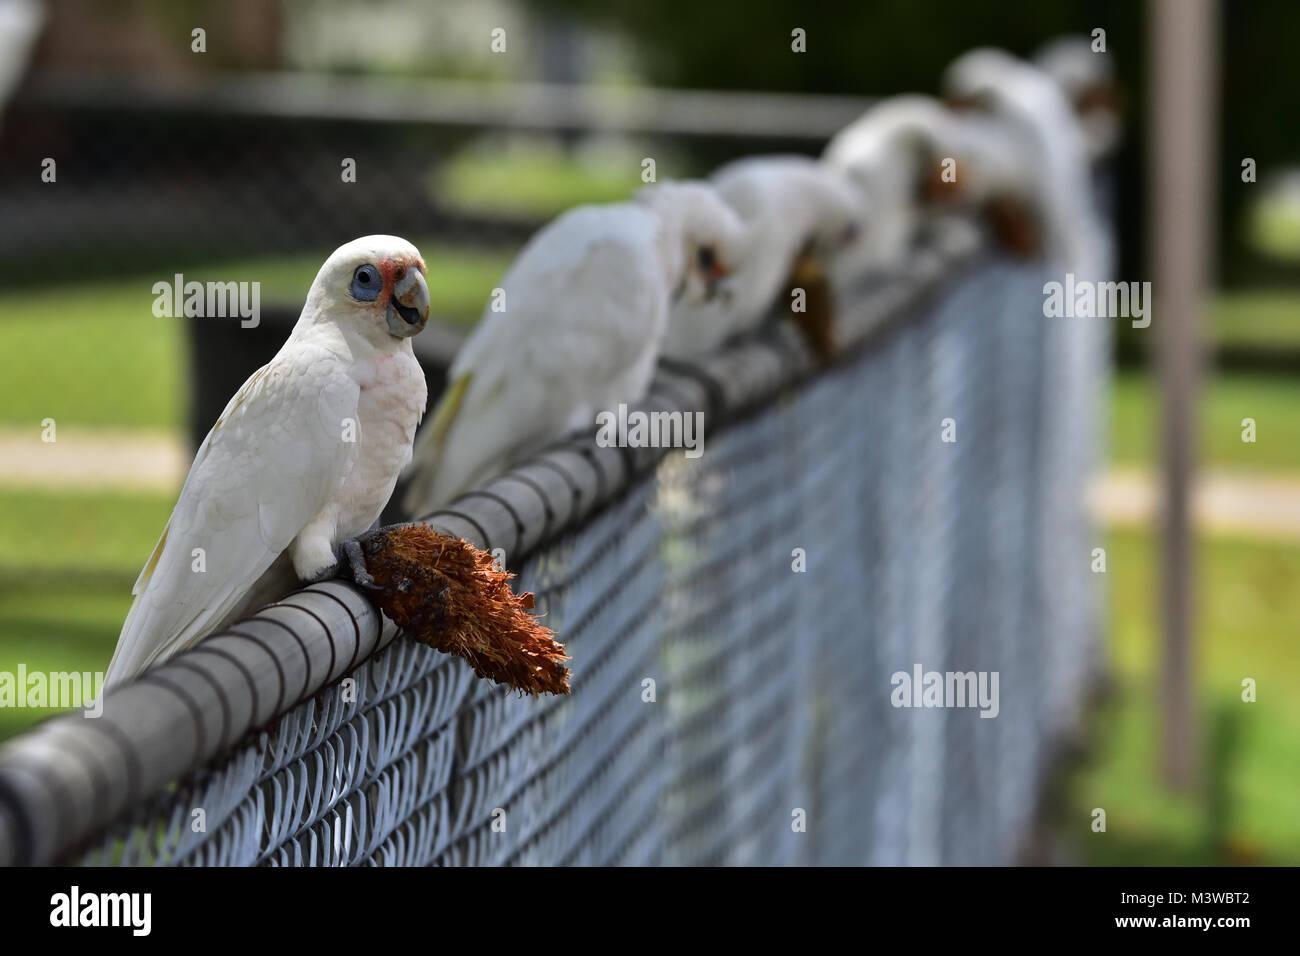 Australian Little Corellas eating a Pine Cone seed - Stock Image